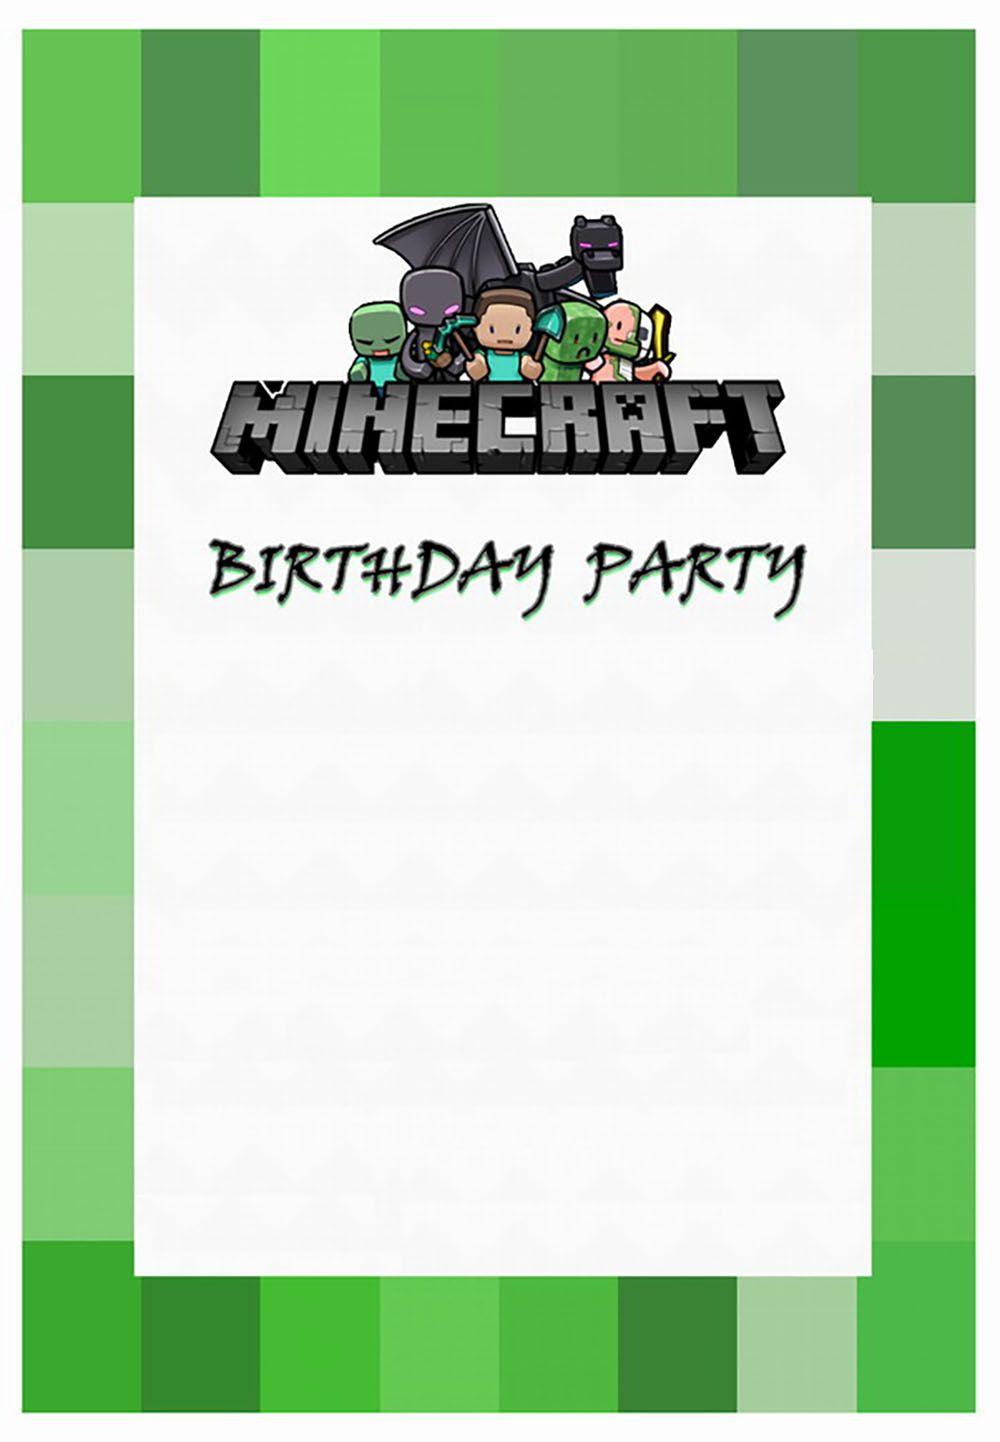 Free Minecraft Invitation | Minecraft | Pinterest | Free, Free ...